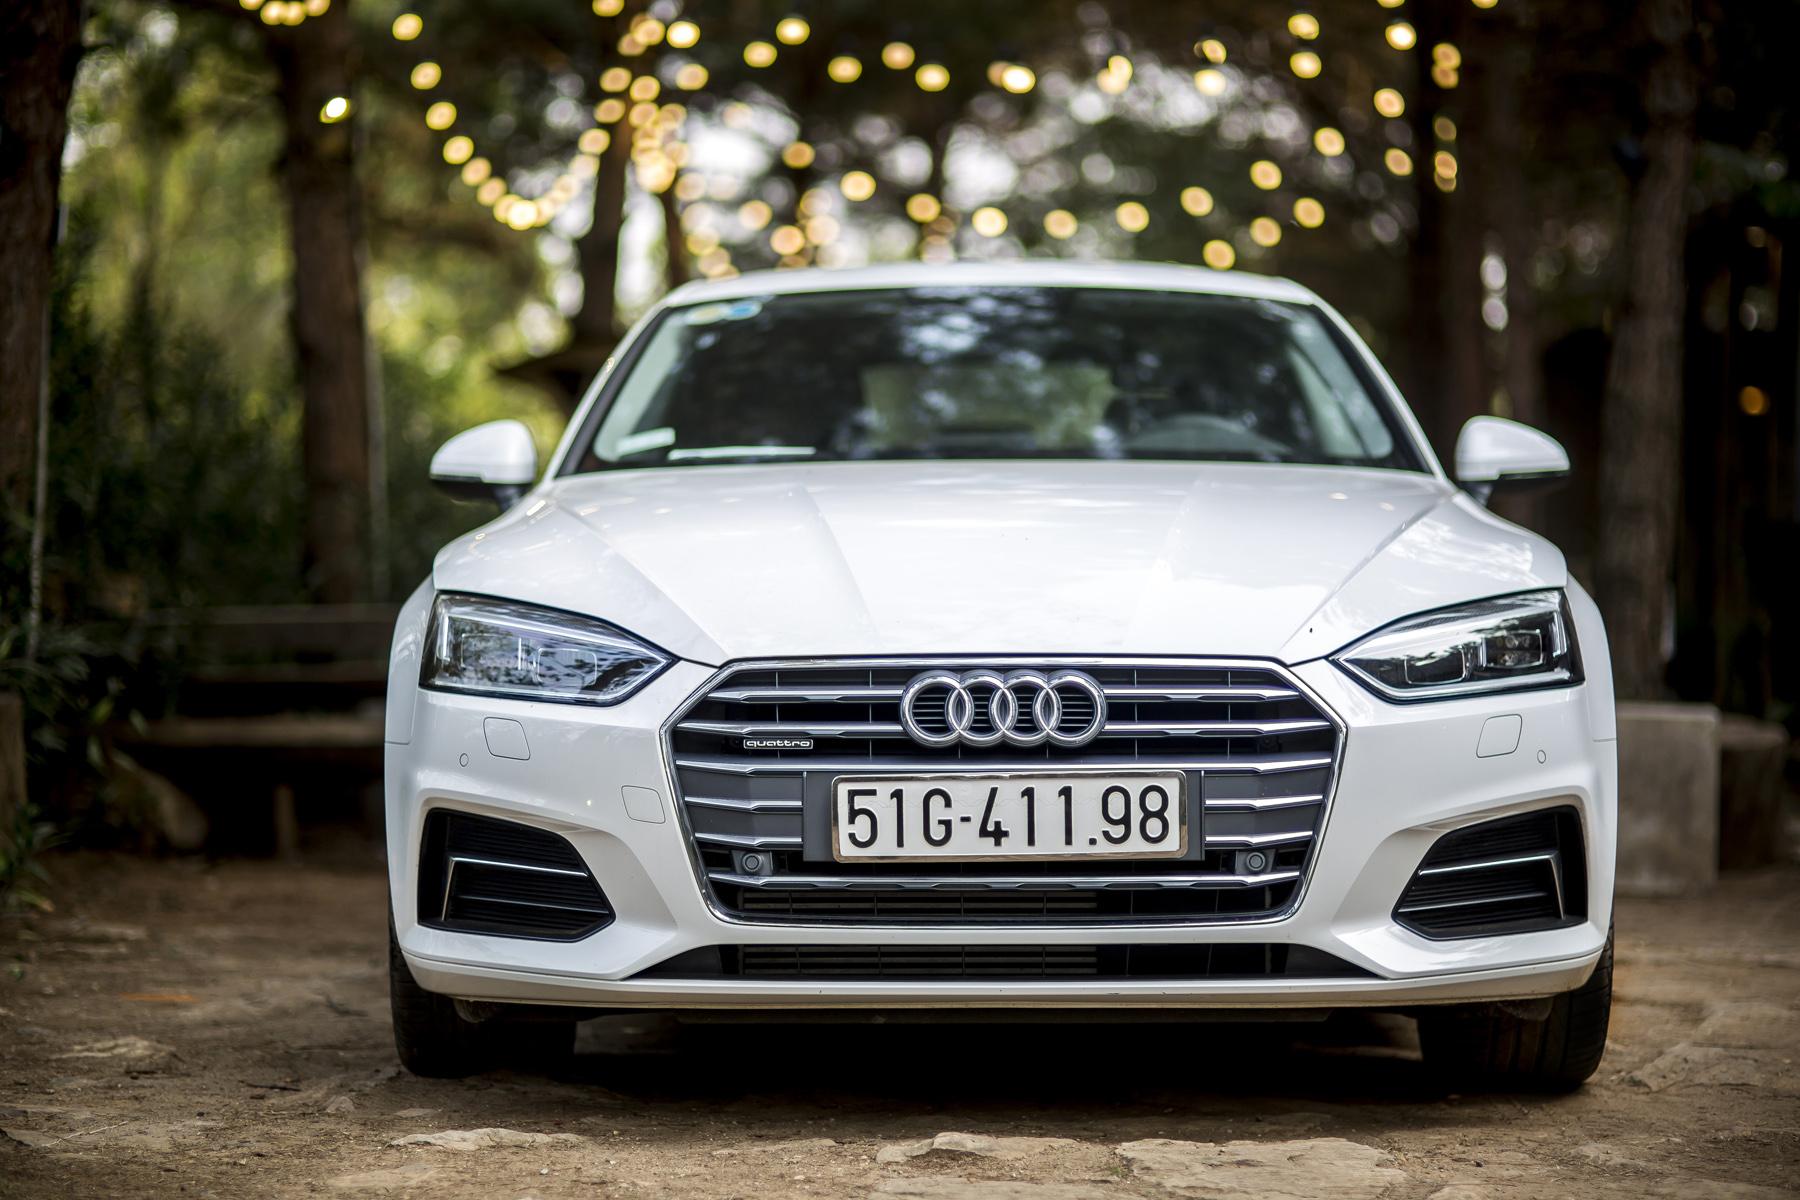 Audi-A5-Sportback-moi-tai-Viet-Nam-An-xang-it-hon-ma-manh-hon-anh-6